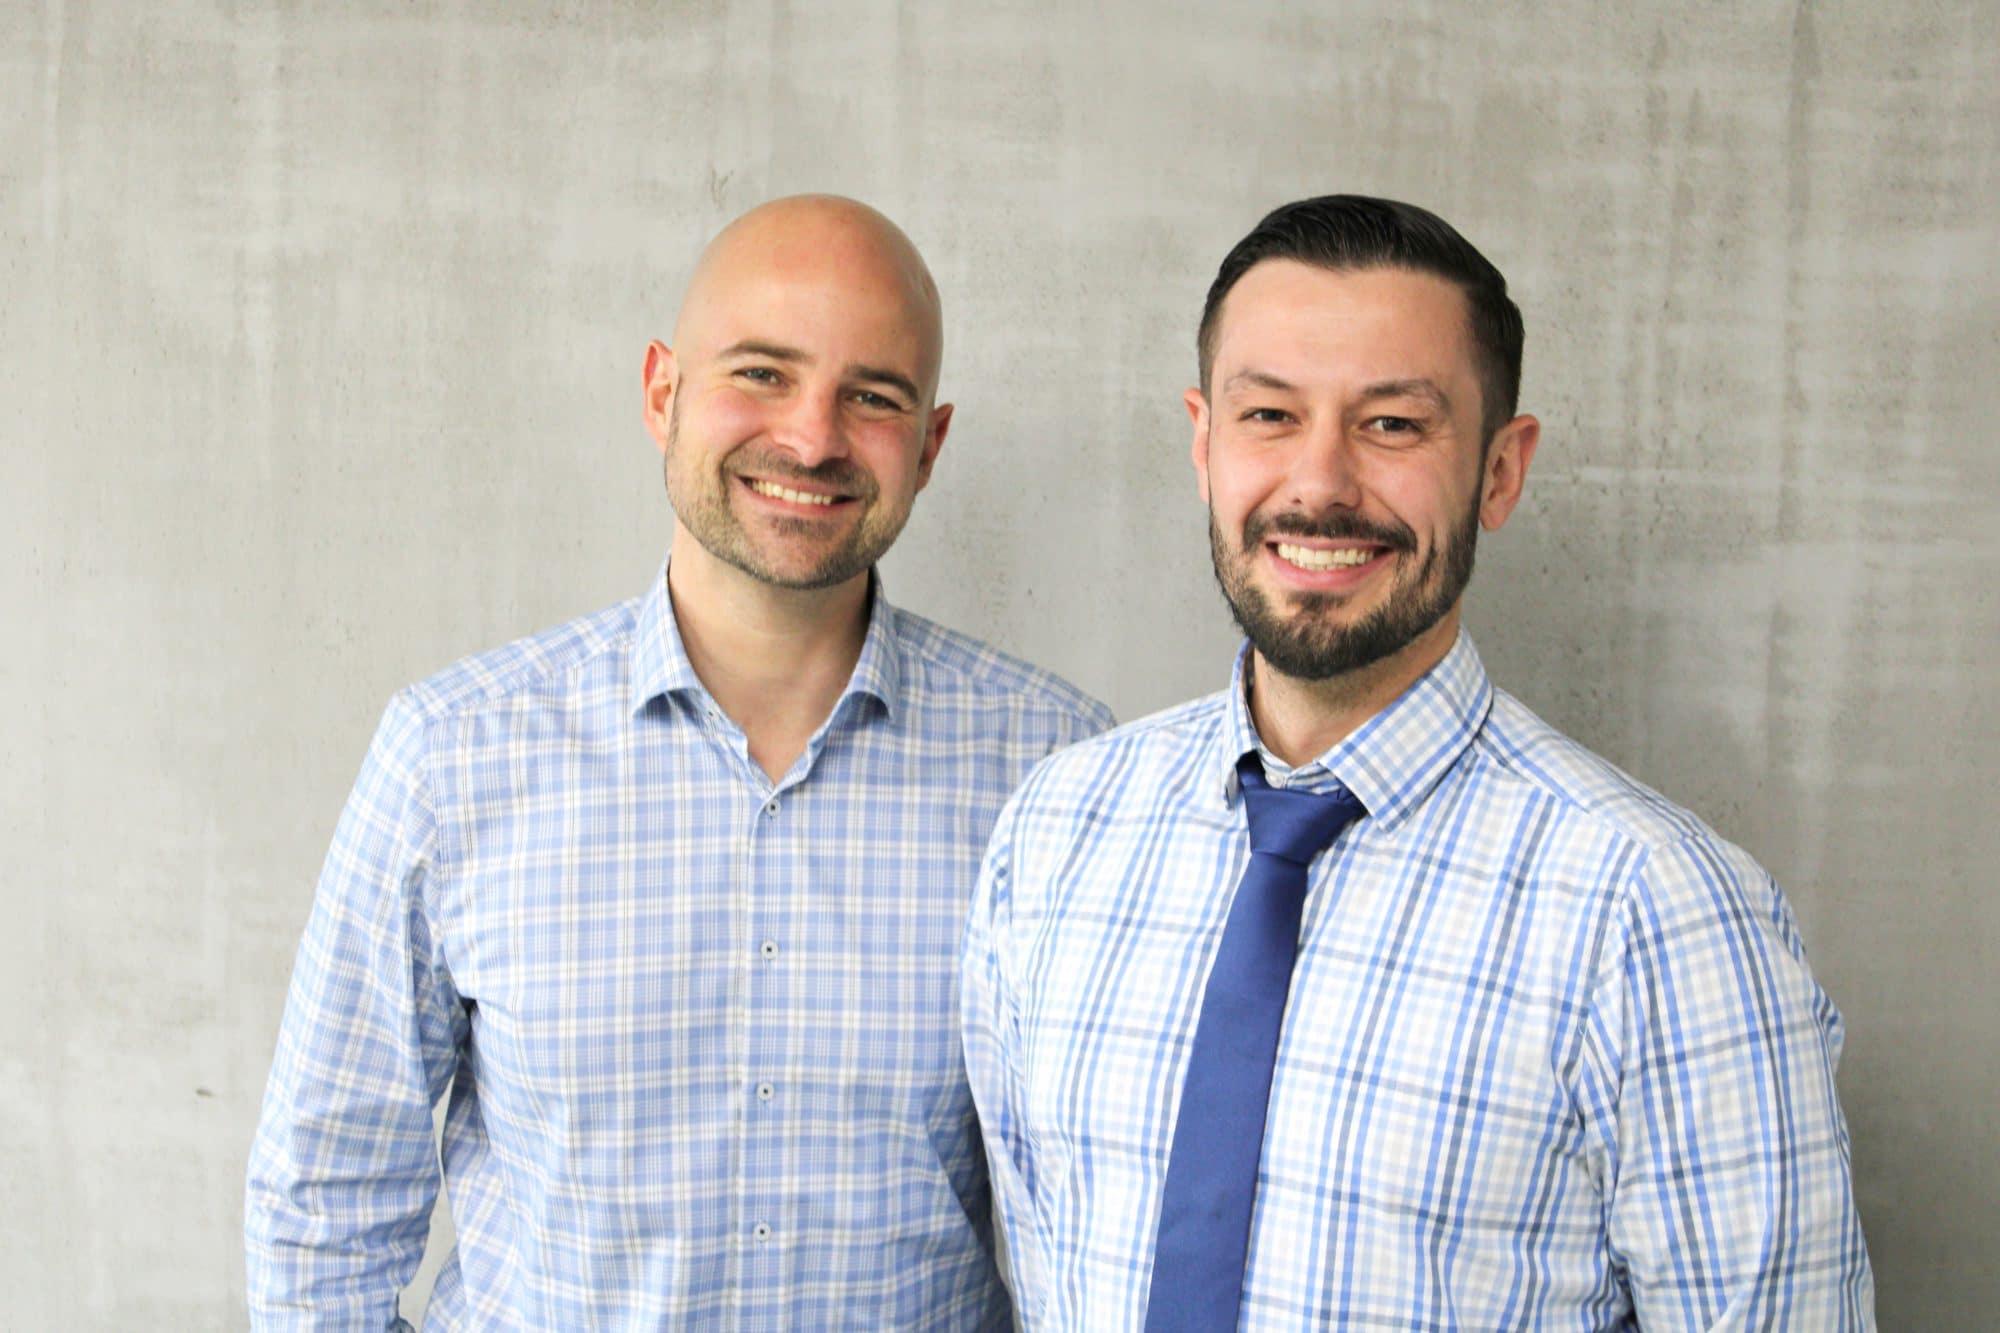 Linkbuilding: Team Paloo